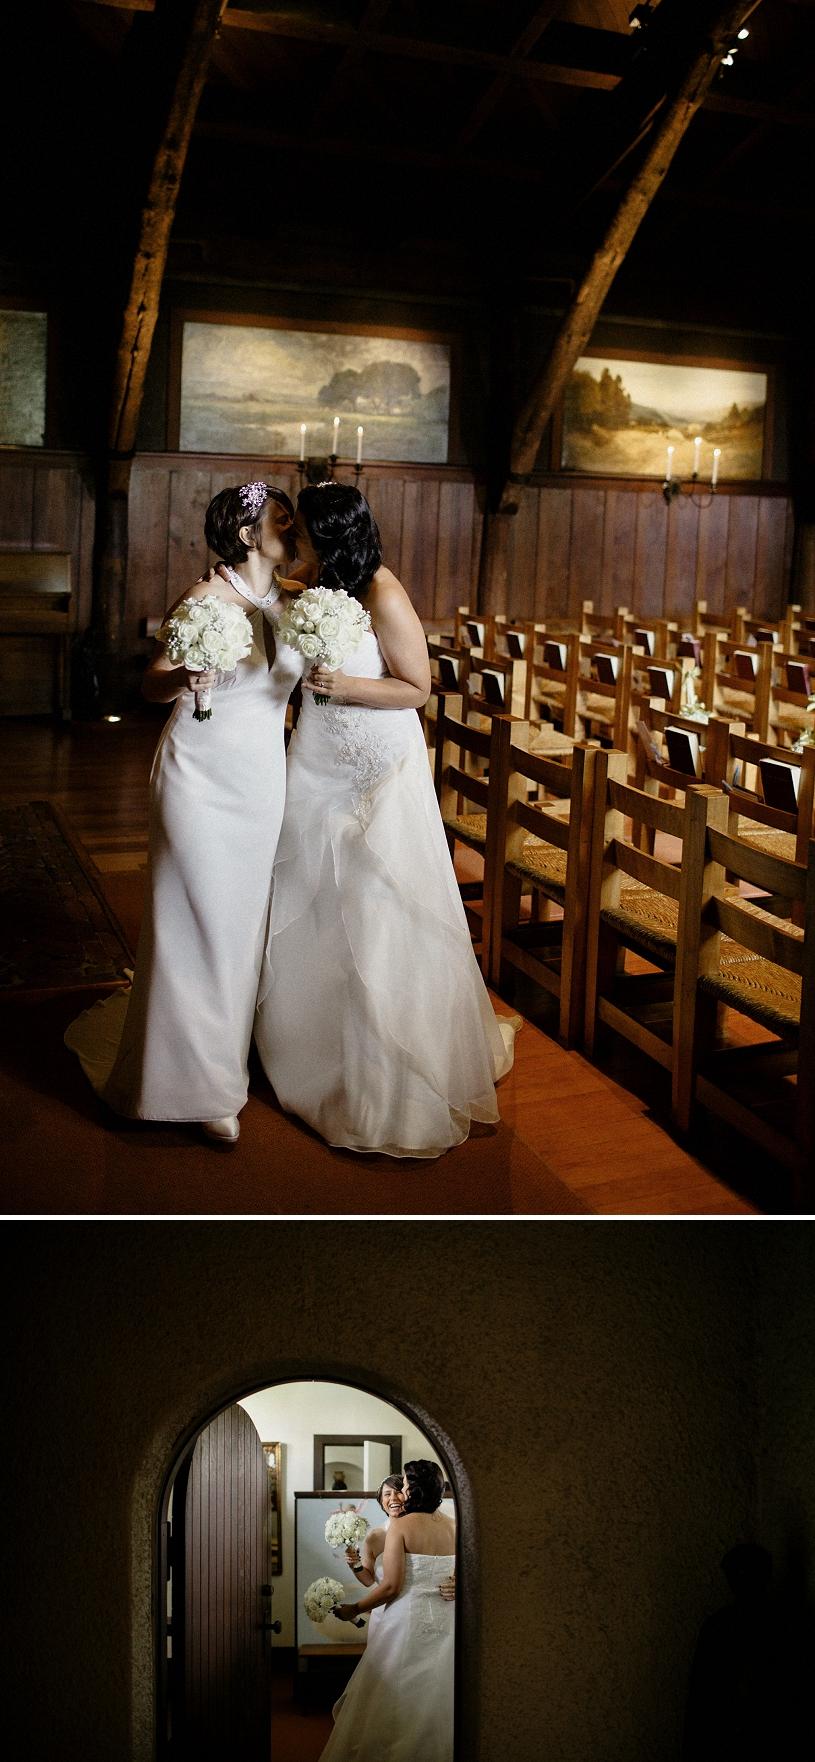 sanfrancisco-lesbian-elopement6